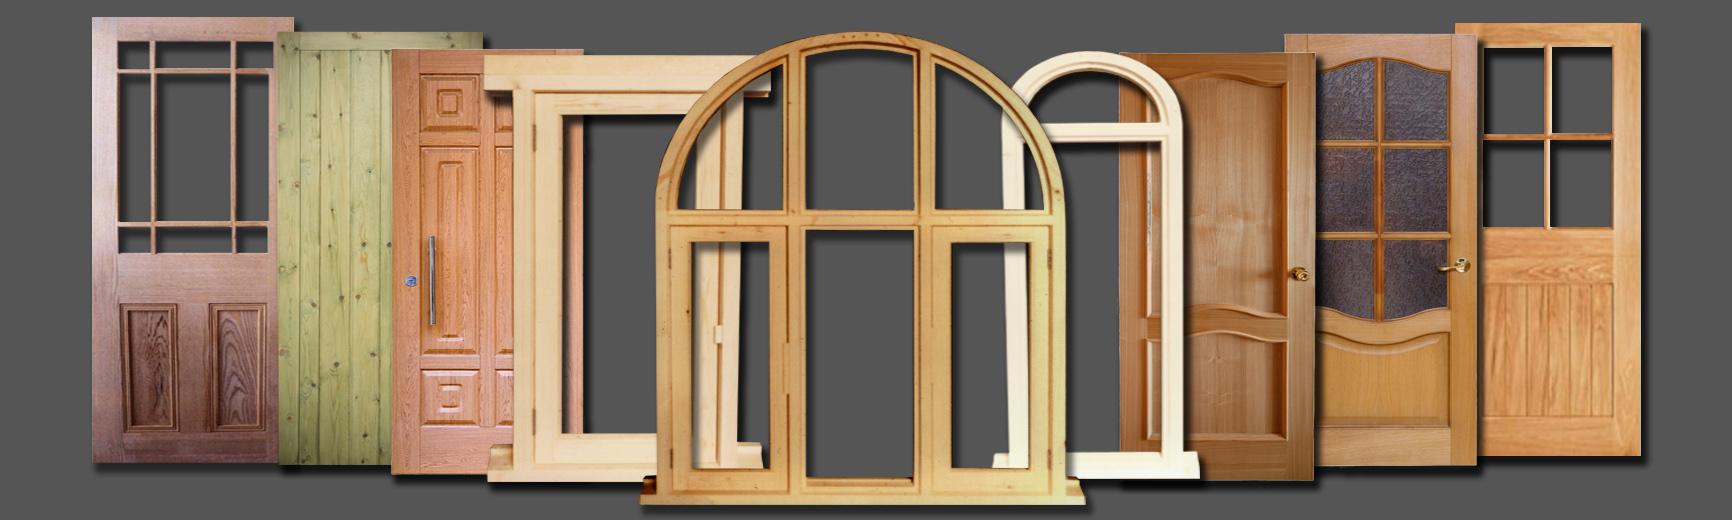 windows-slide-5